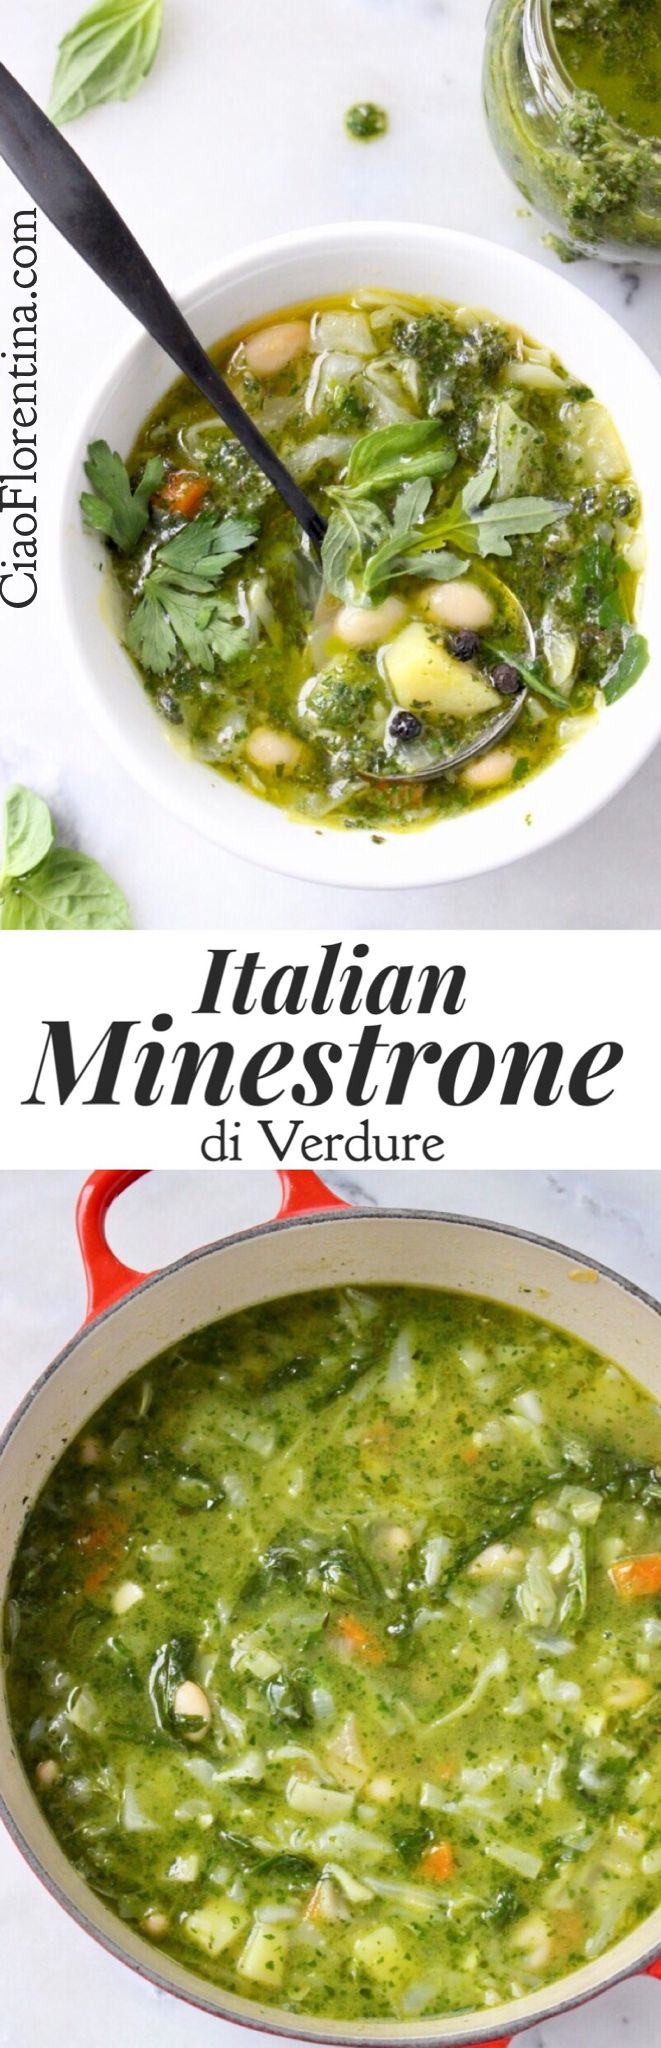 Italian Green Minestrone Recipe, Zuppa di Verdure with Cabbage, Potatoes and Basil Pesto | CiaoFlorentina.com @CiaoFlorentina